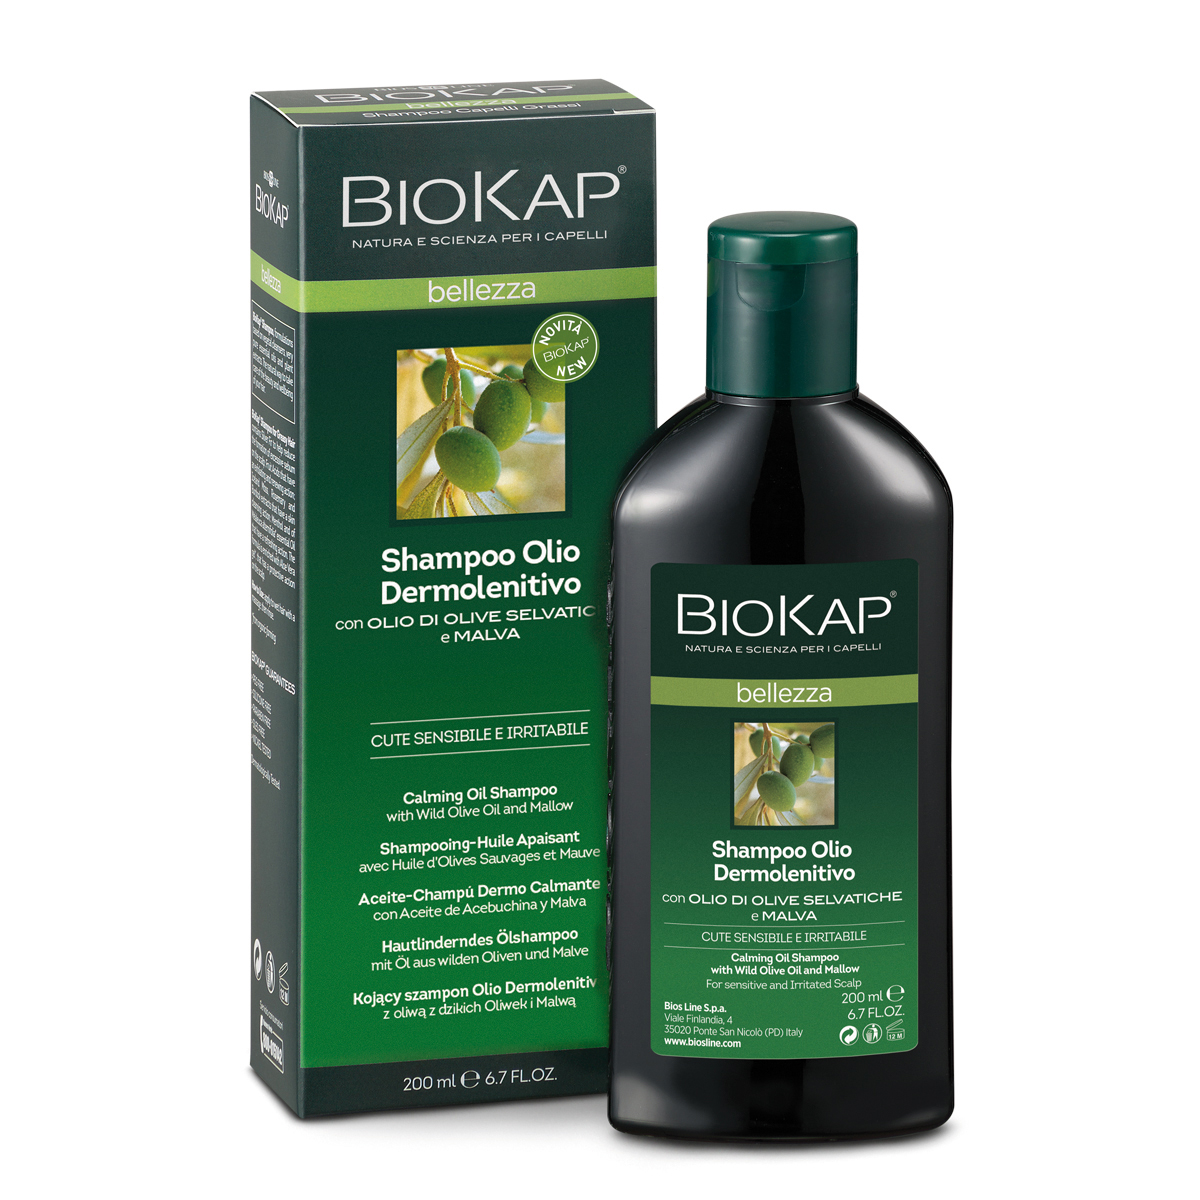 Shampooo Olio Dermolenitivo